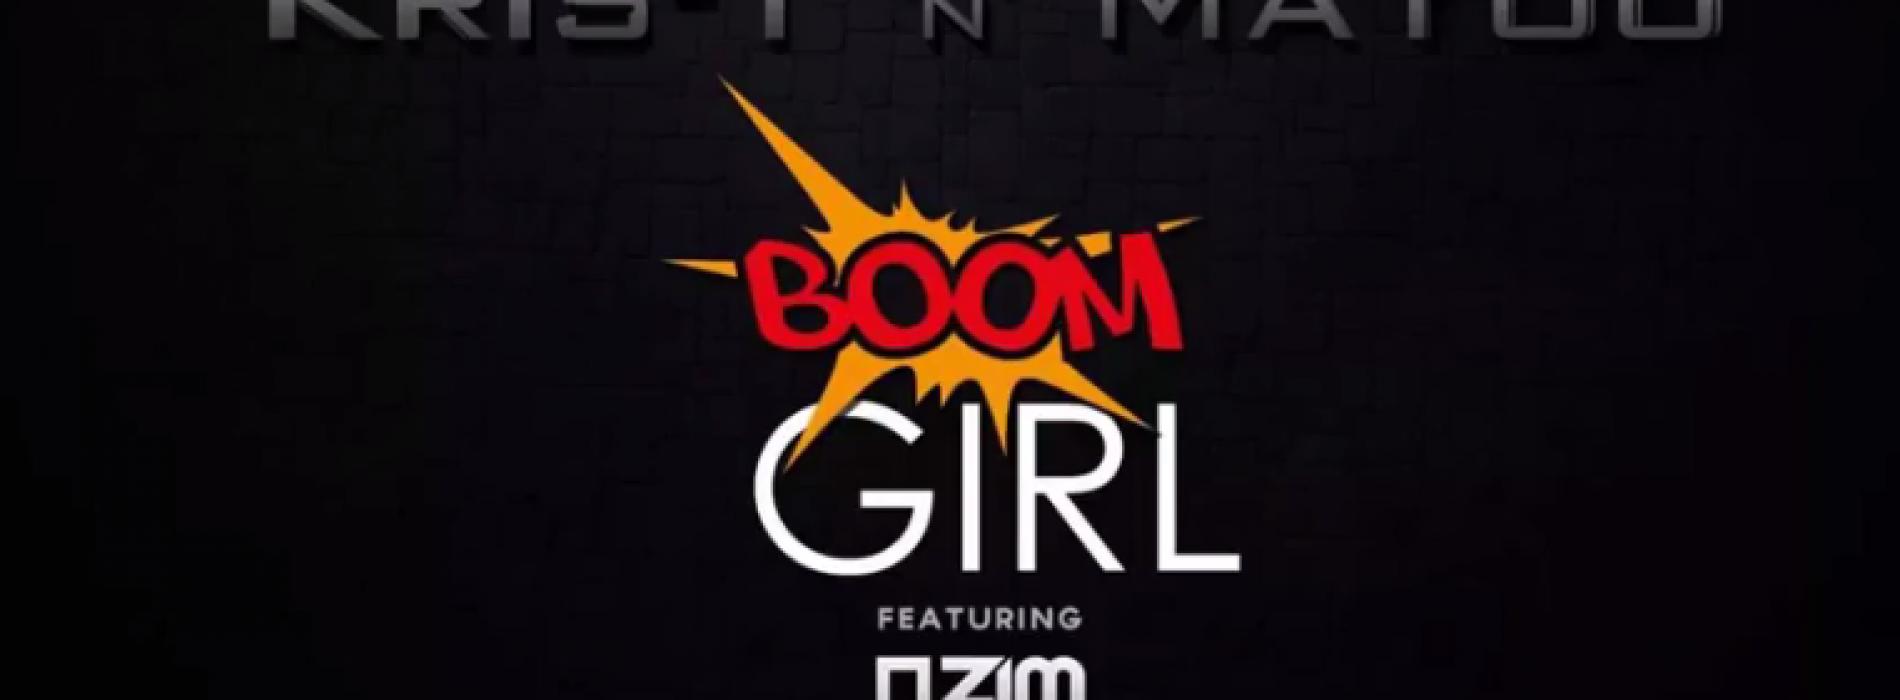 Kris T 'n' MaYoo ft Azim Ousman – Boom Girl